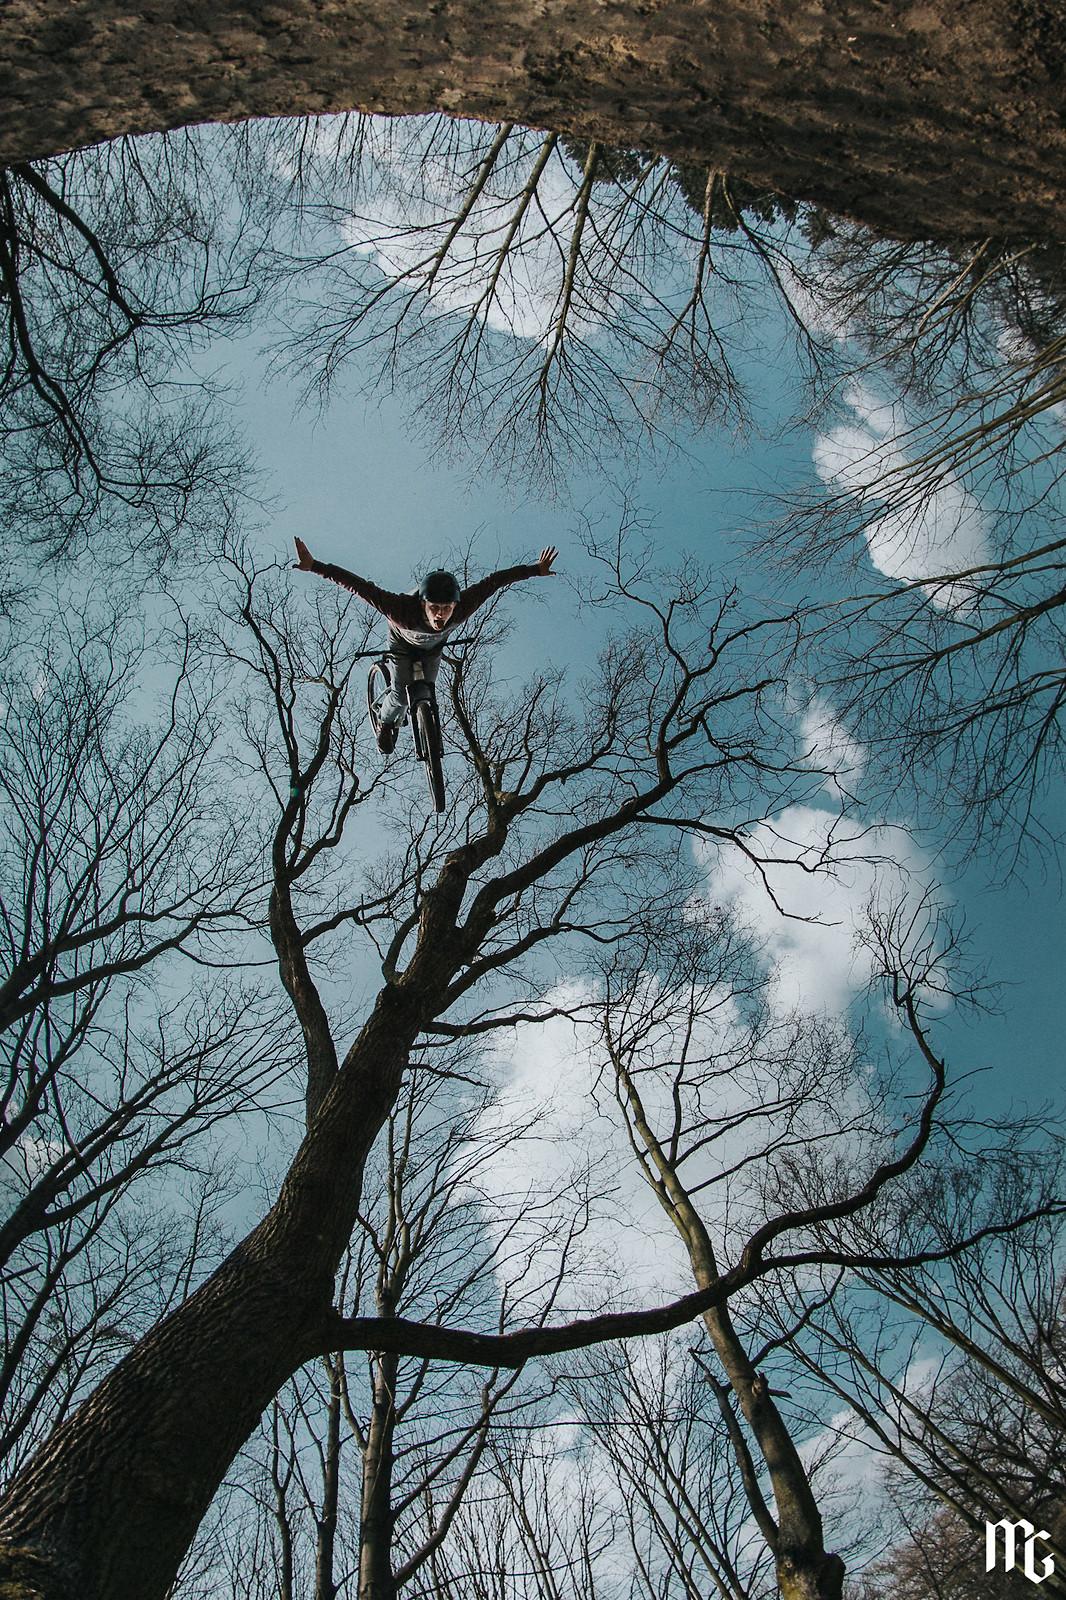 Backflip oldie - Kick!Photo - Mountain Biking Pictures - Vital MTB